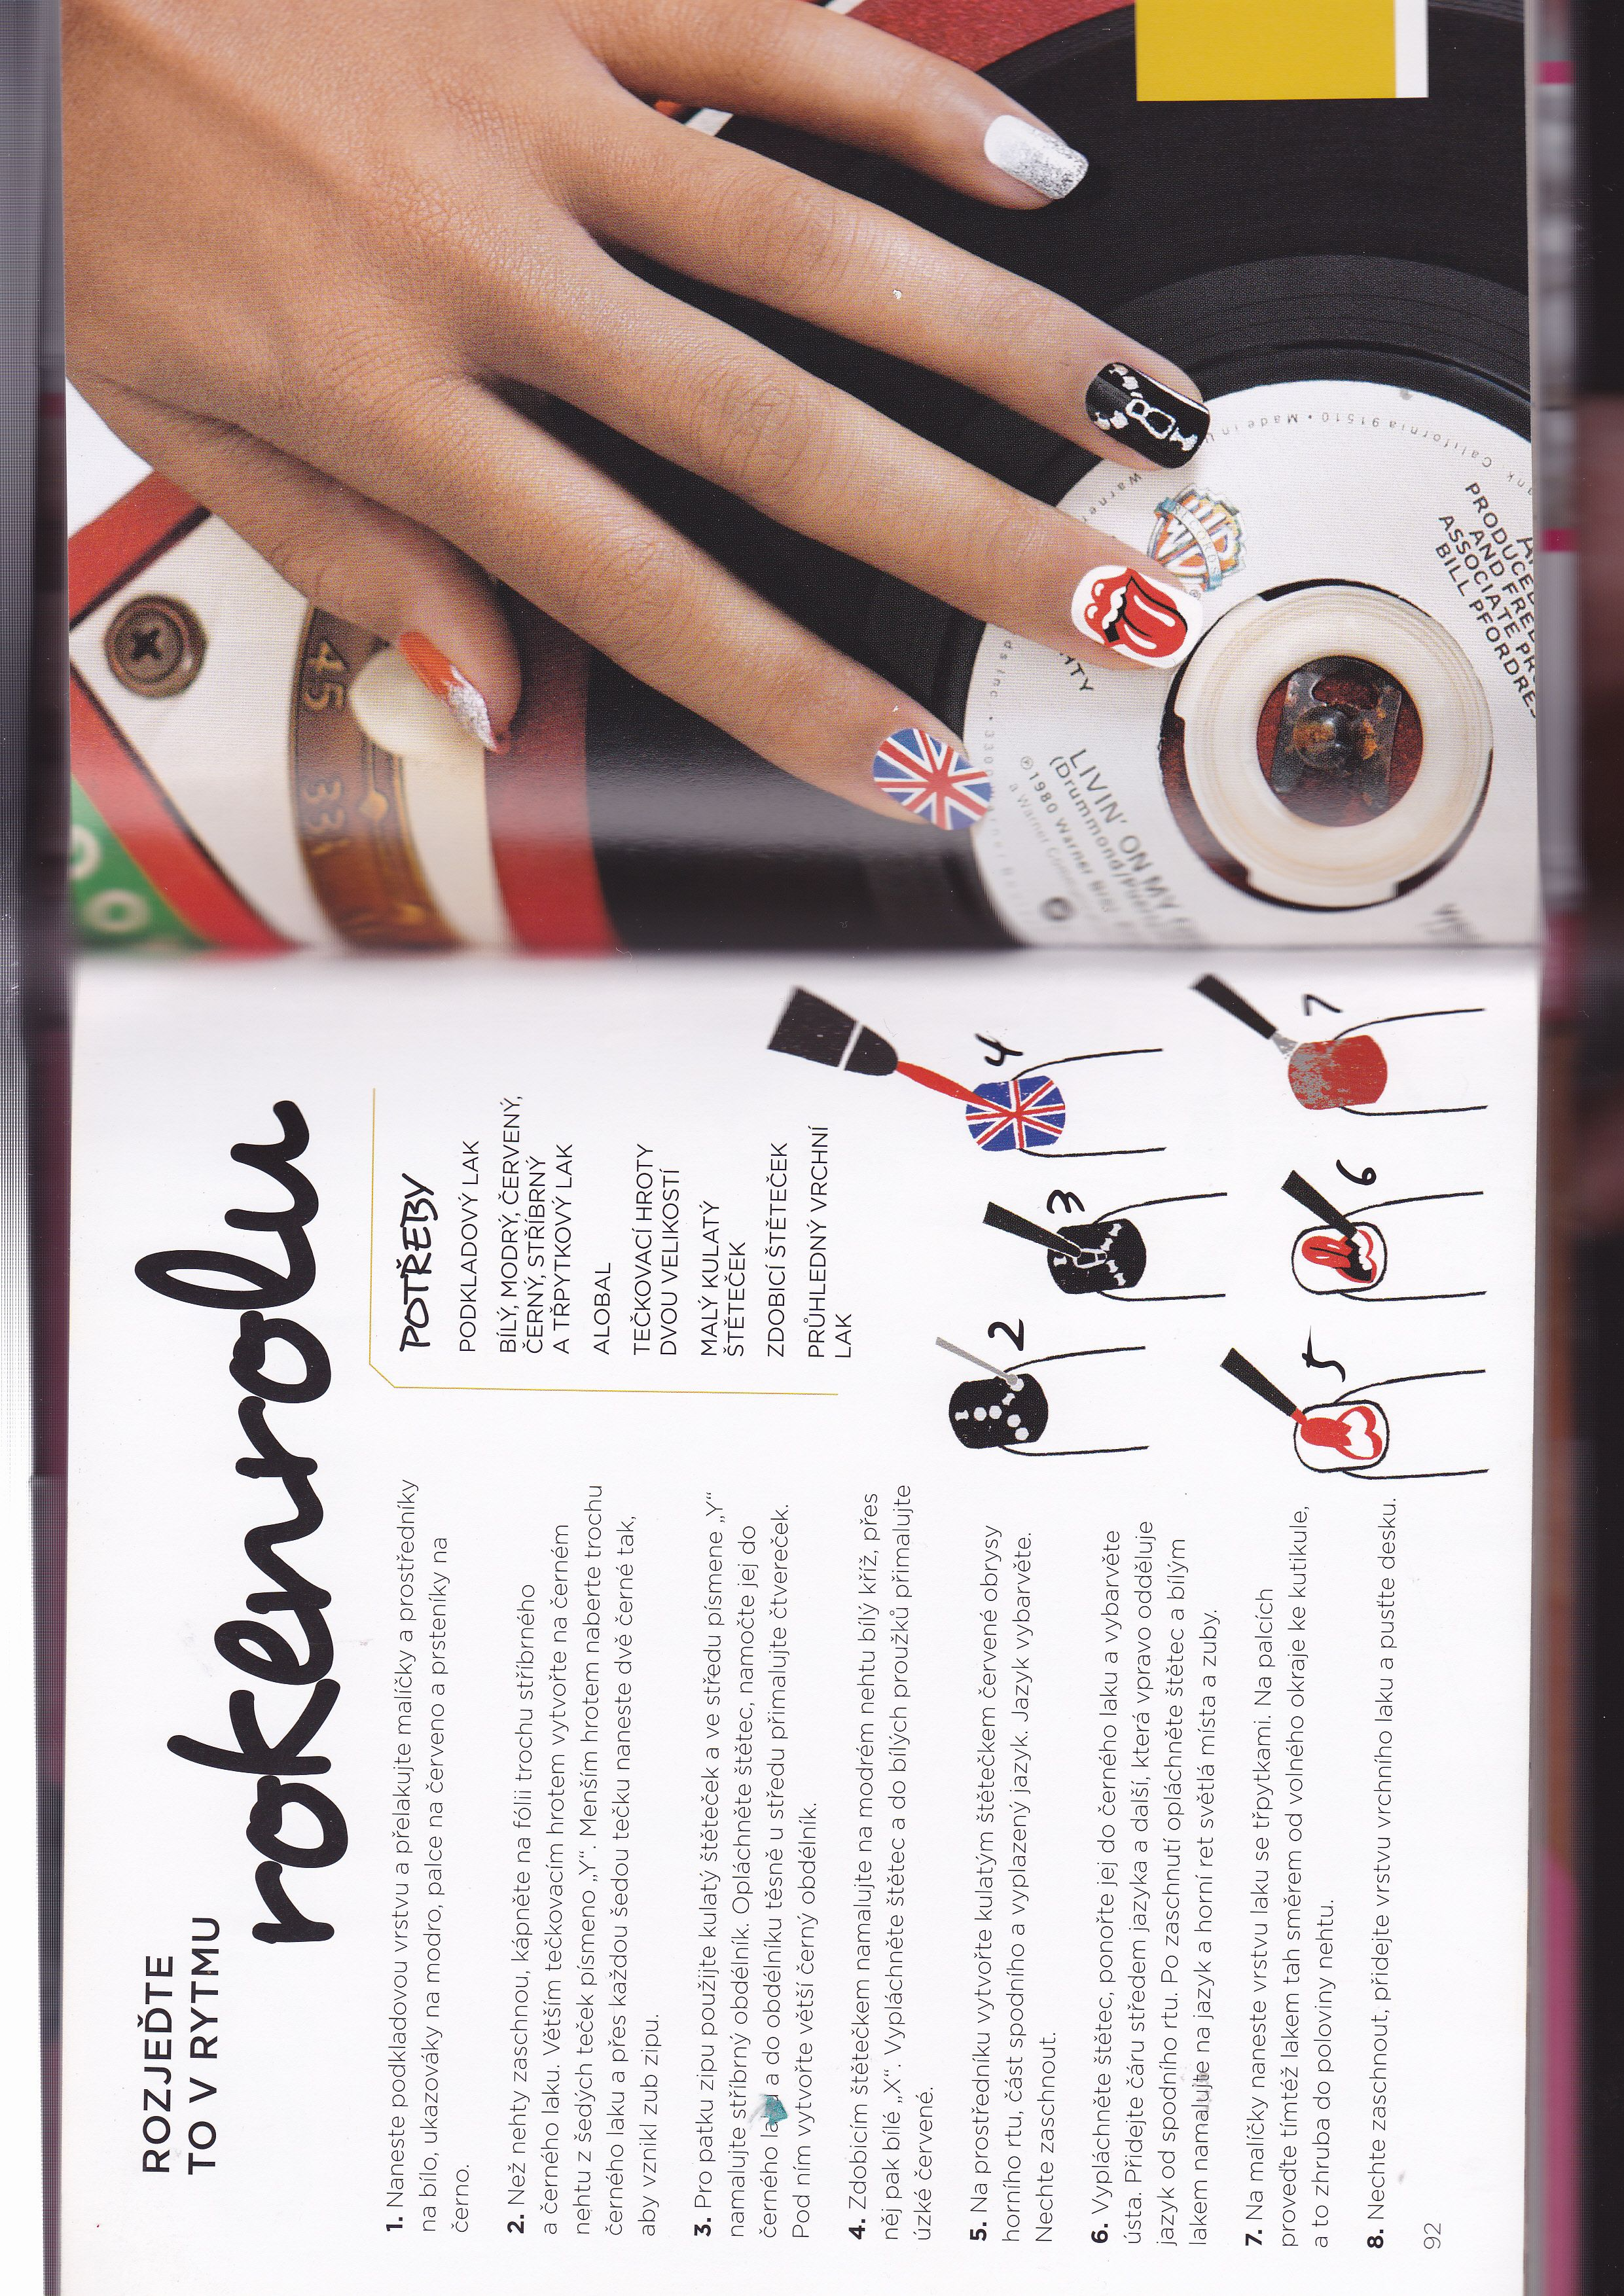 Pin Uzivatele Alis Na Nastence Nails Renovace